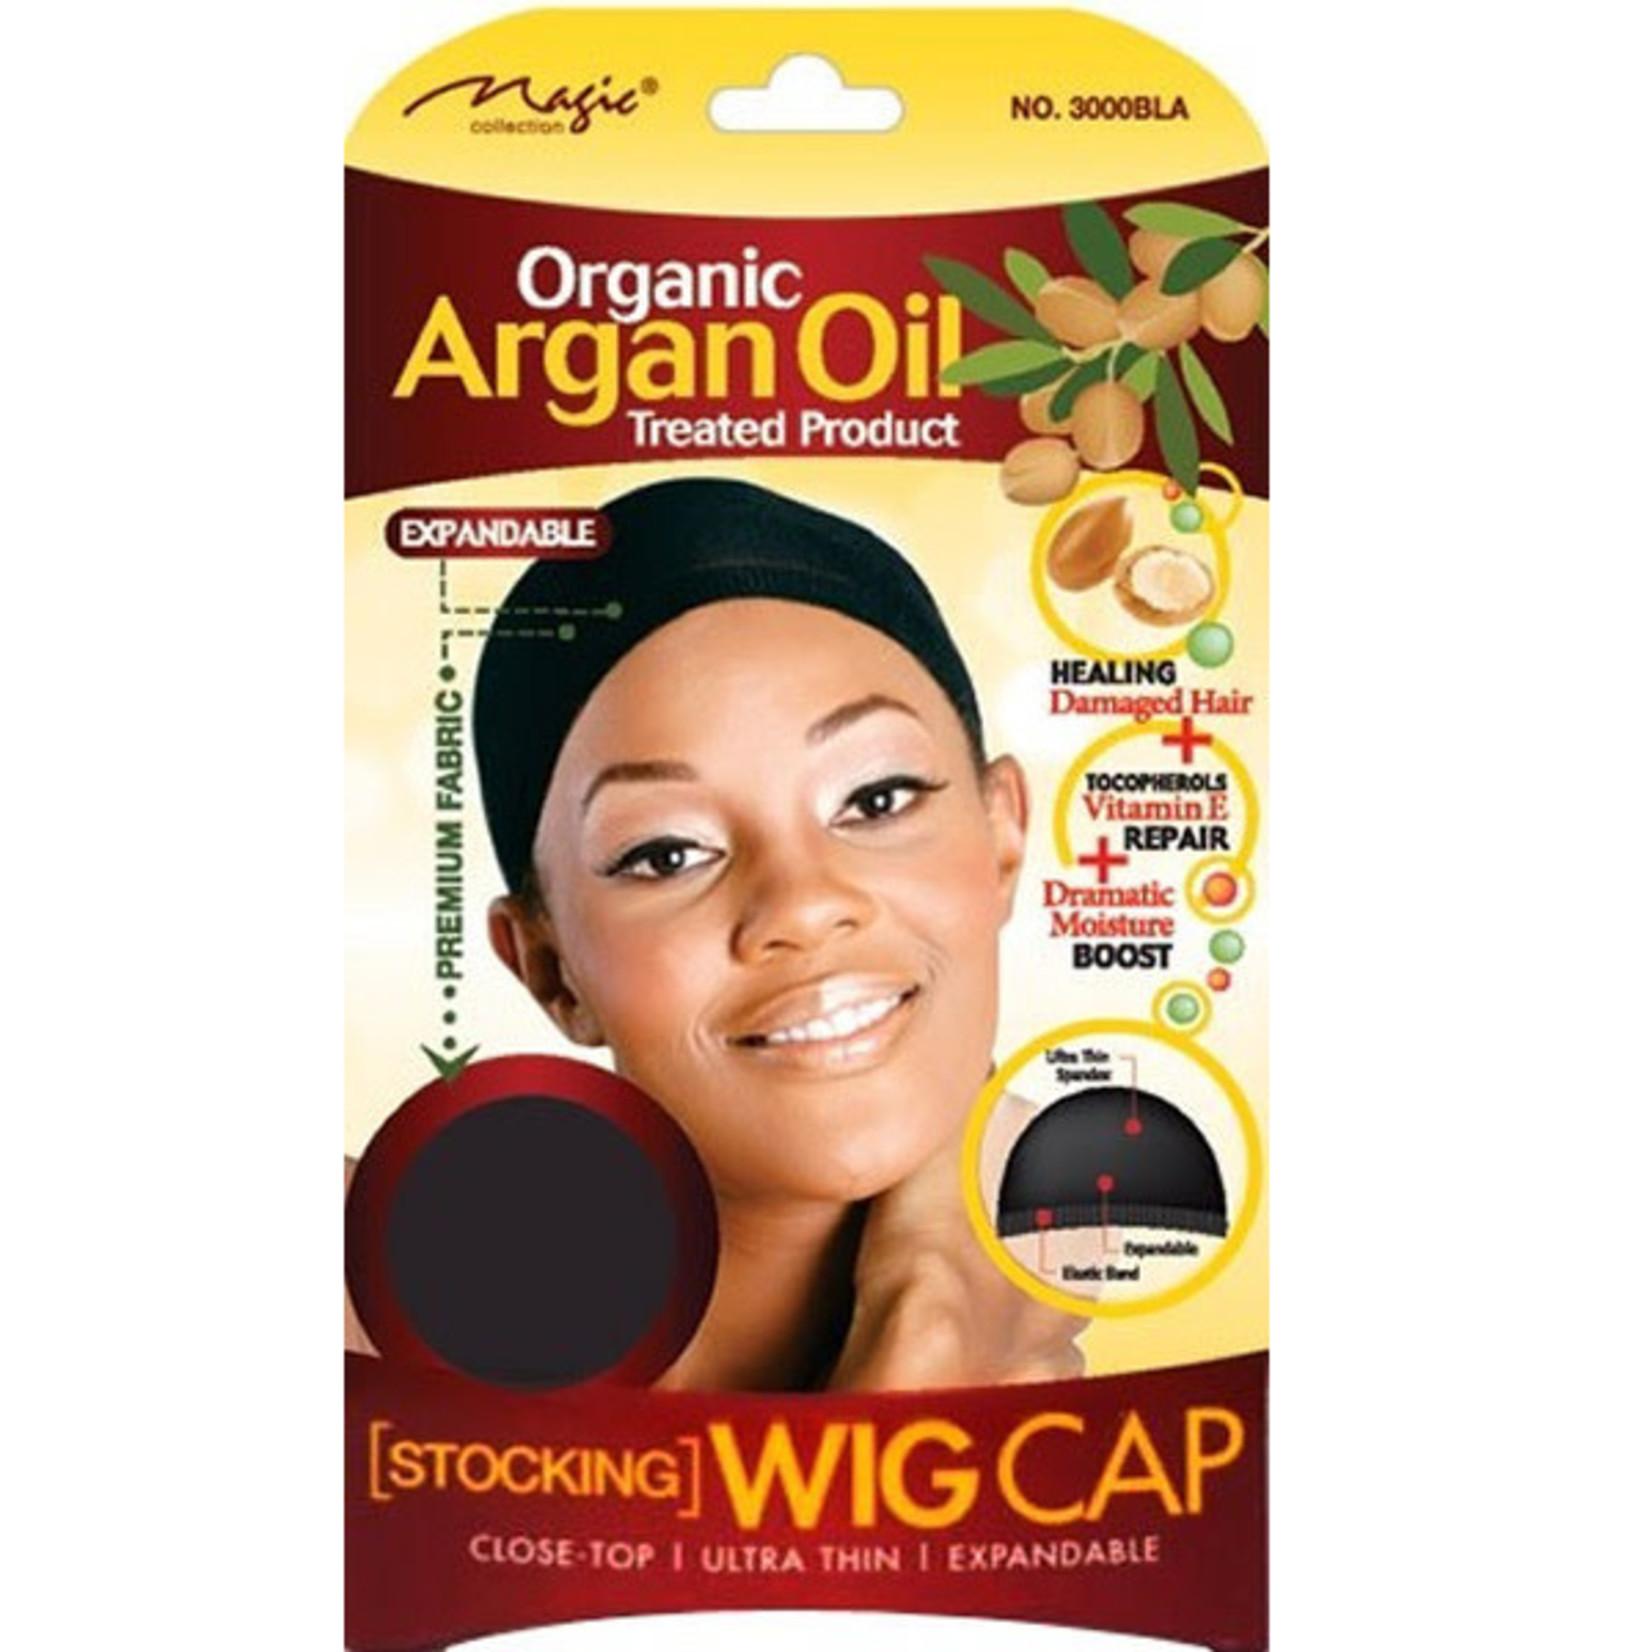 MAGIC COLLECTION MAGIC COLLECTION 2PCS ORGANIC ARGAN OIL STOCKING WIG CAP - BLACK